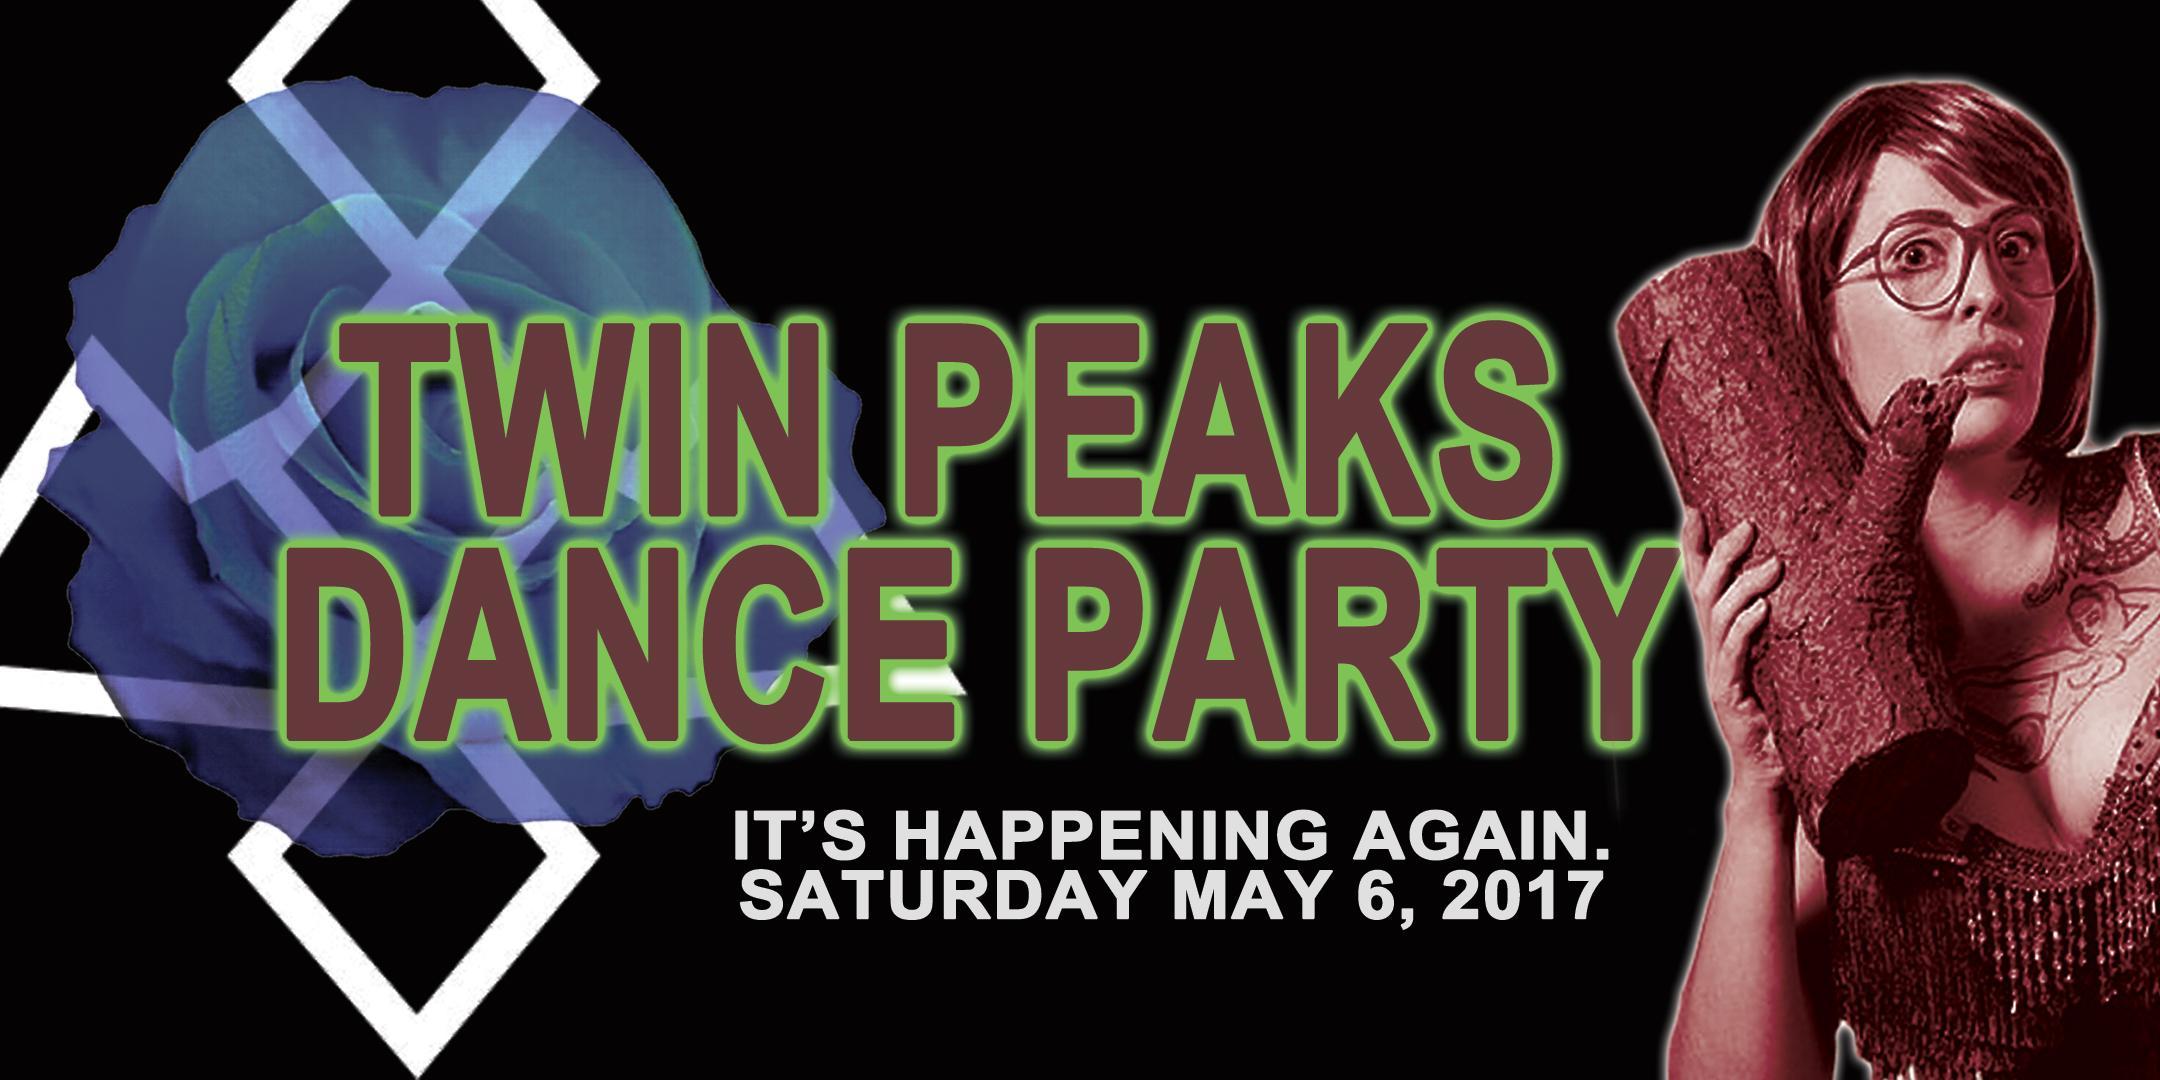 Twin Peaks Dance Party. Twin Peaks Dance Party